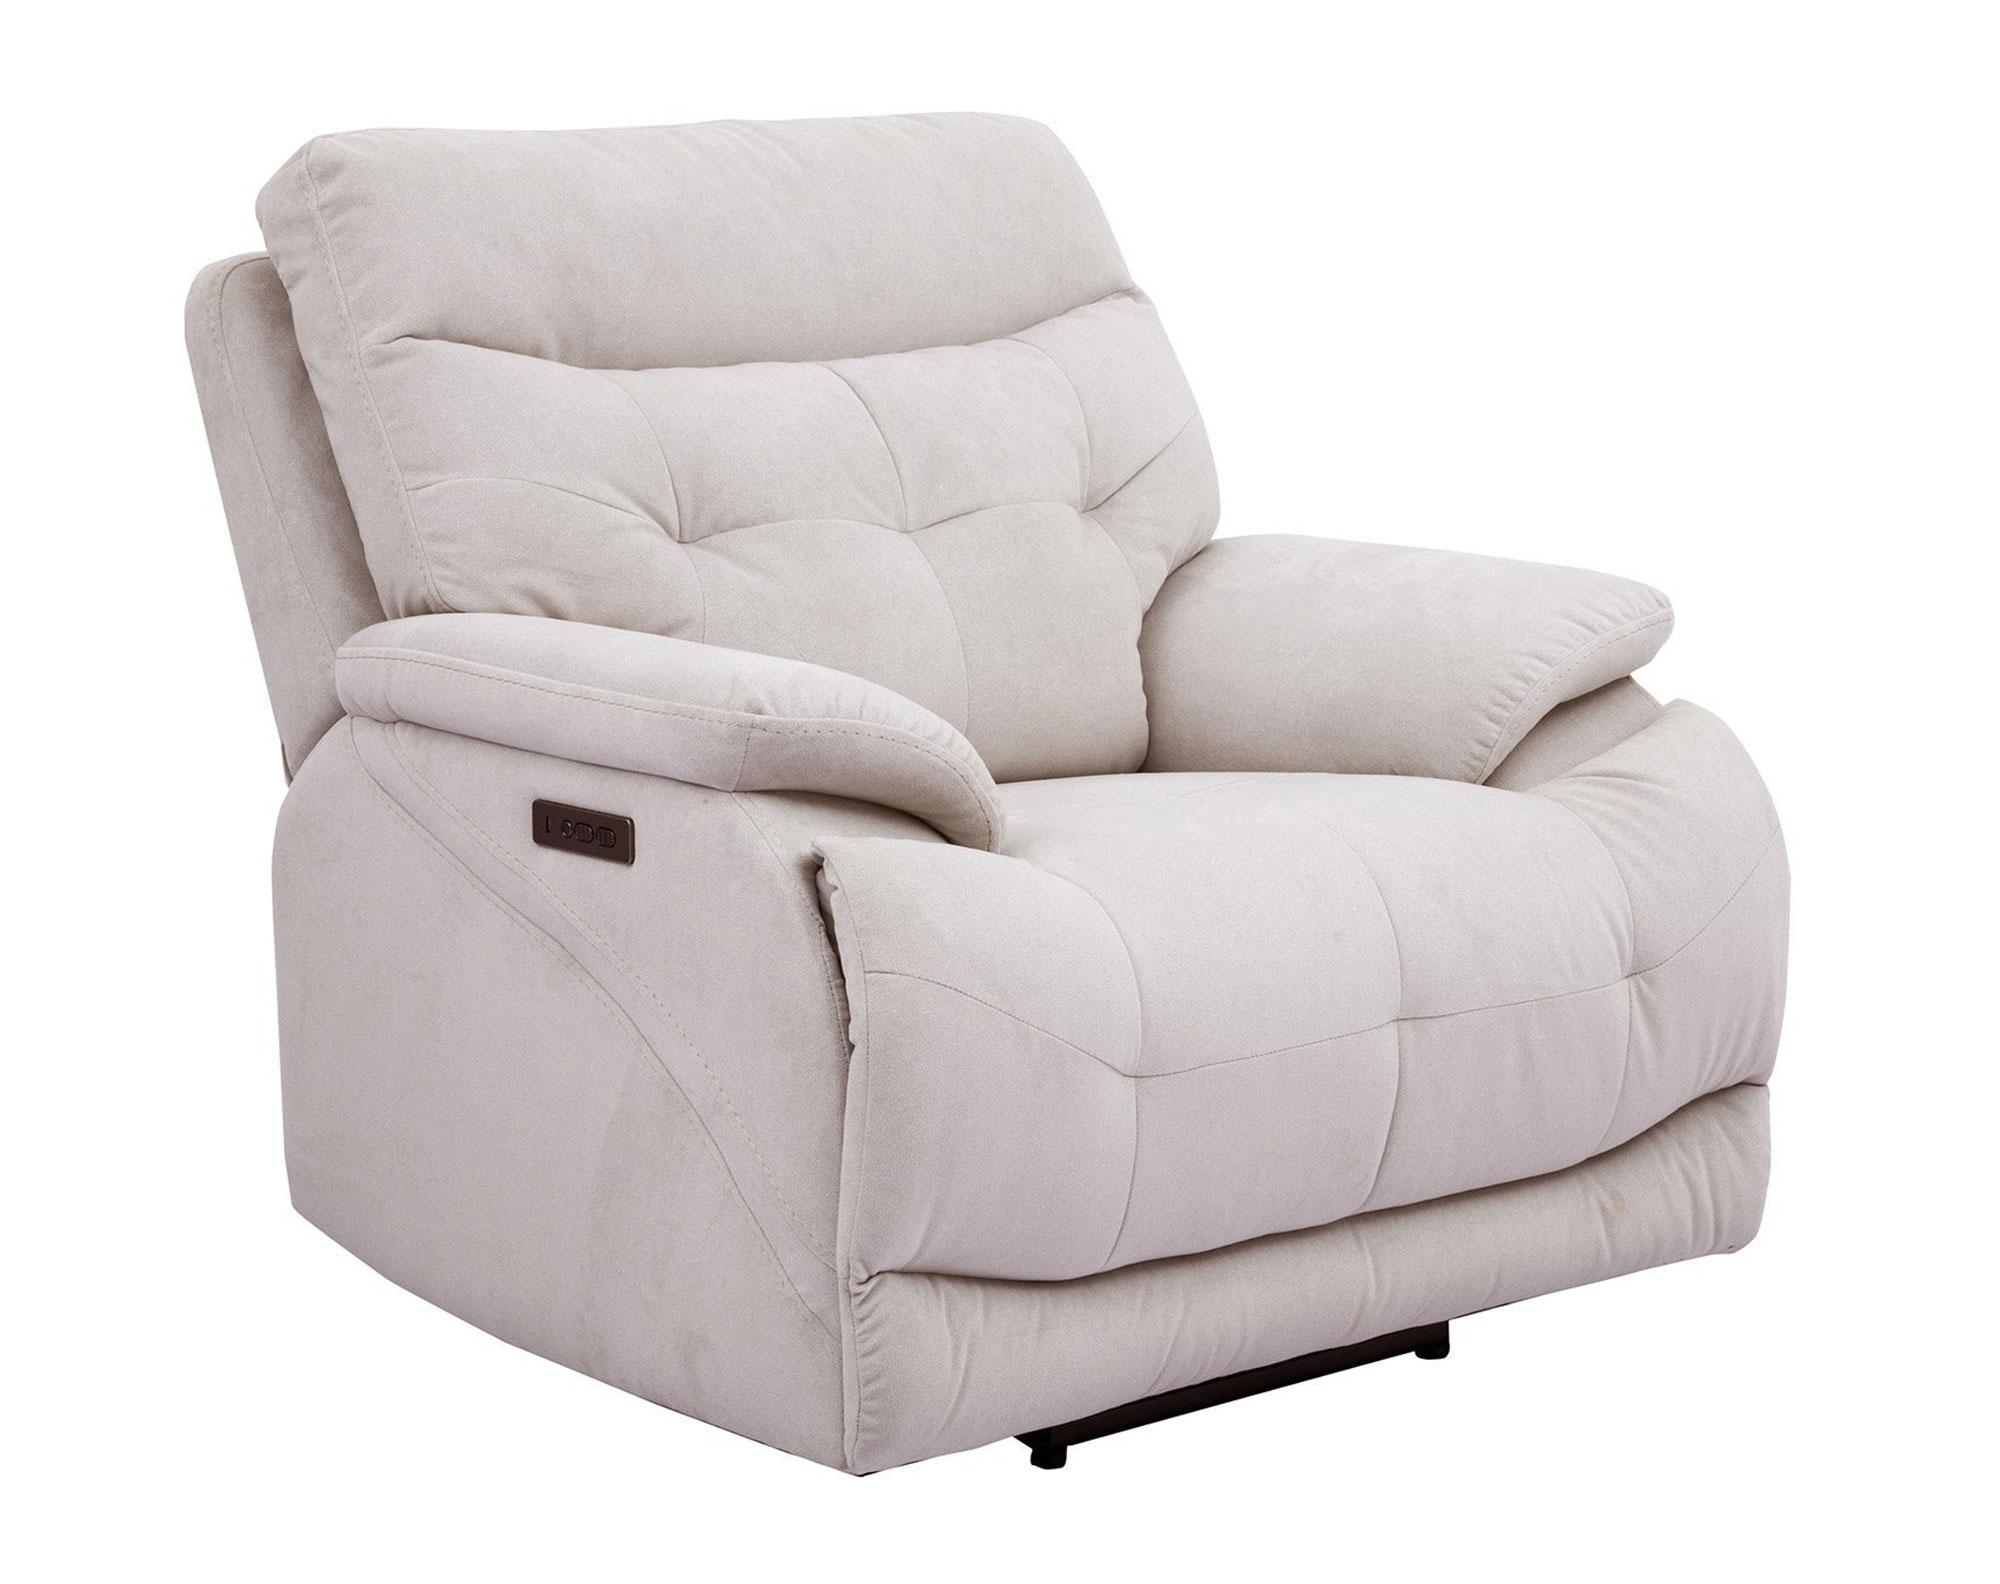 Fabulous Stratus Cozy Power Sofa With Power Headrest Sofas And Ibusinesslaw Wood Chair Design Ideas Ibusinesslaworg